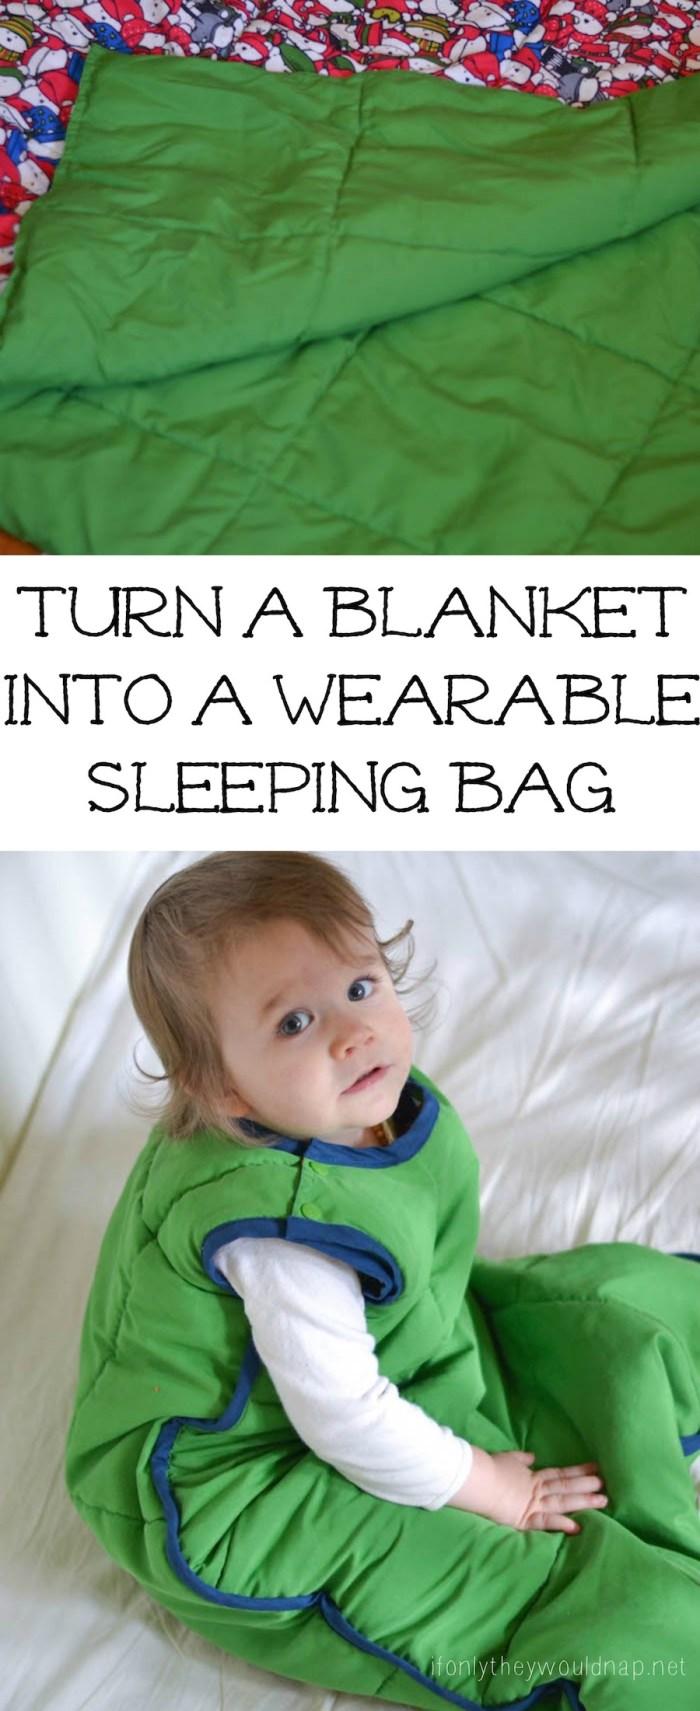 Turn a blanket into a wearable sleeping bag